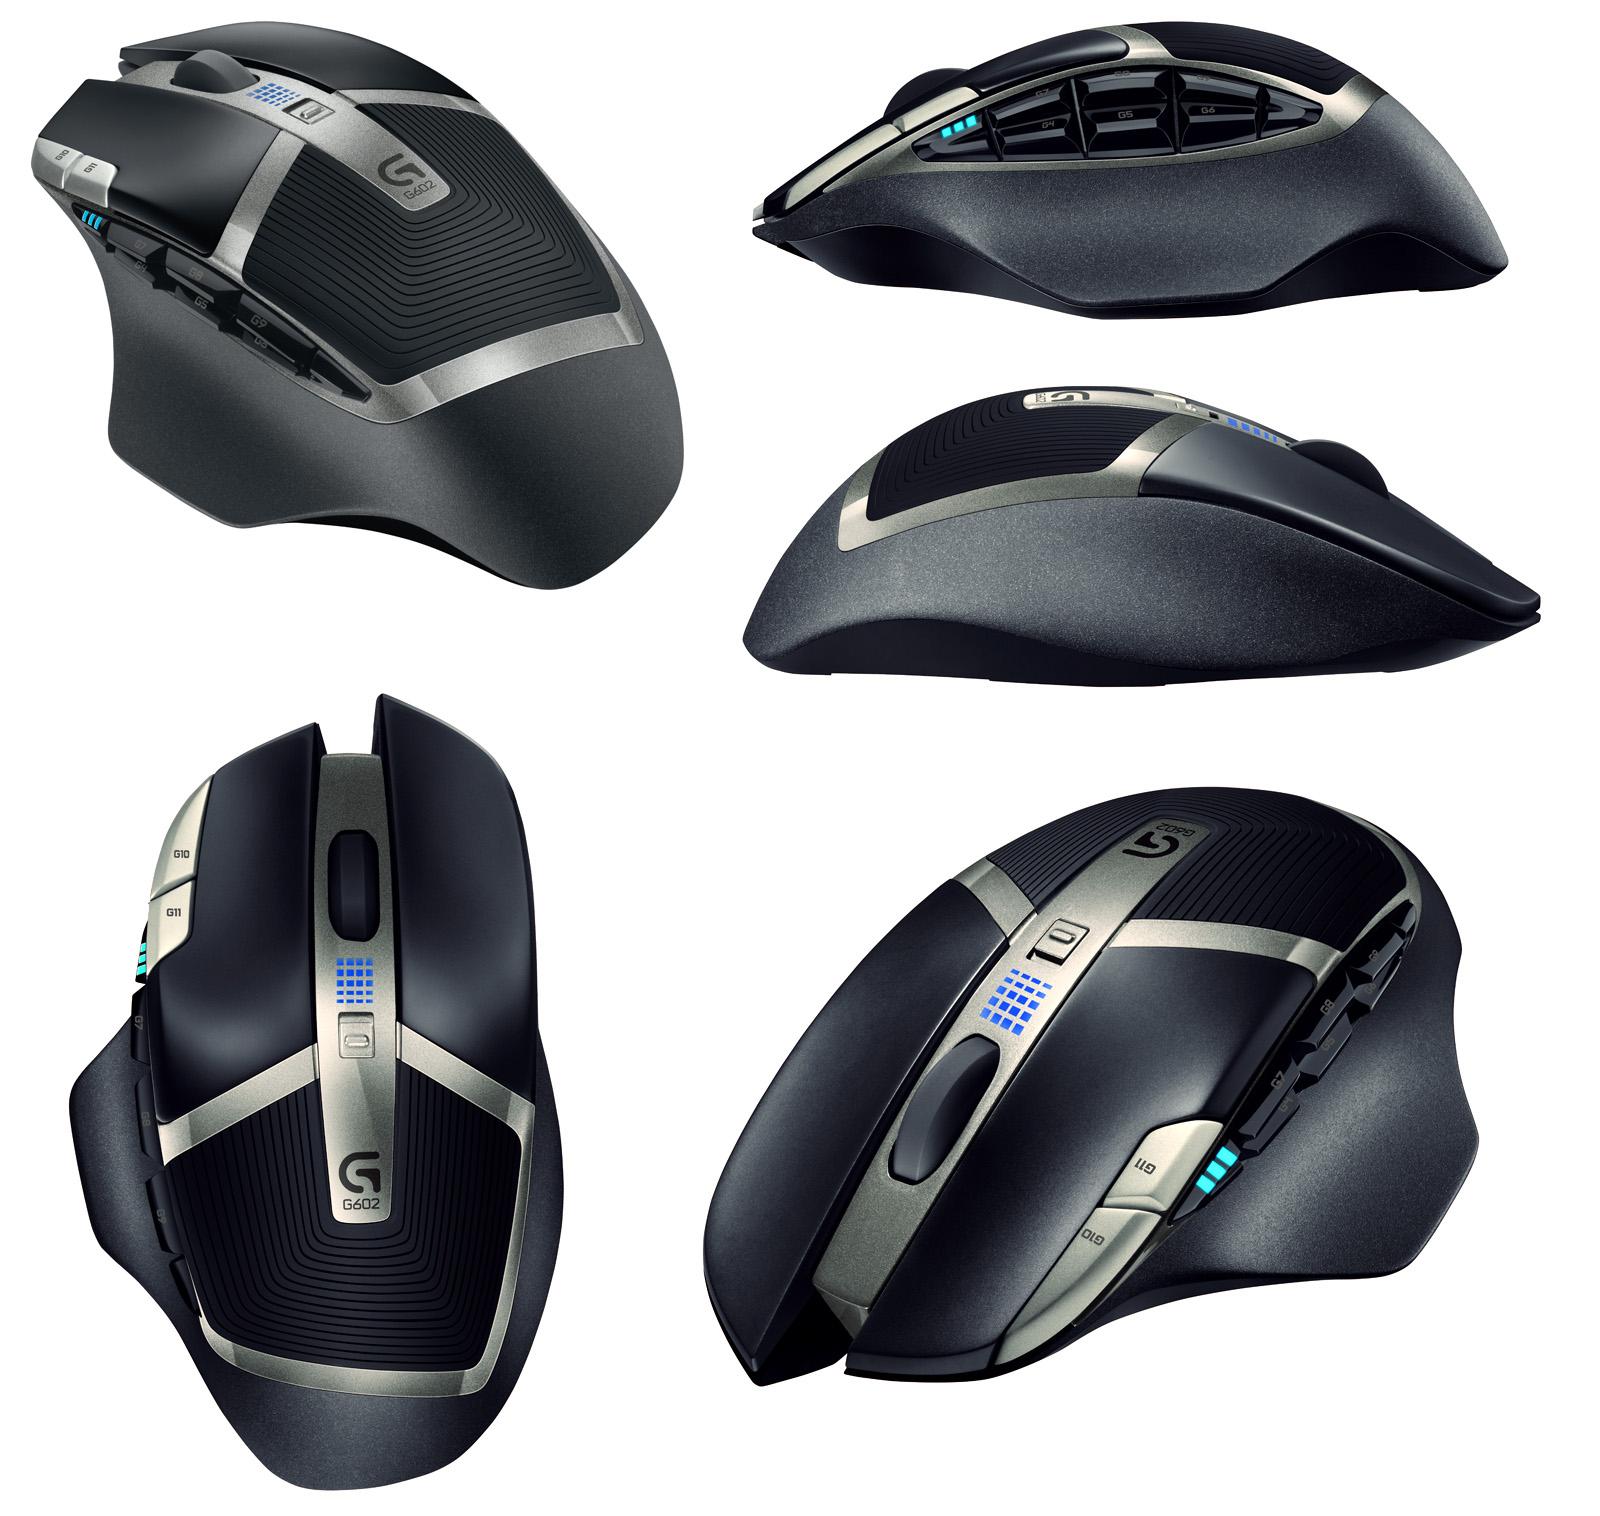 rigelt: Logitech G602 Mouse announced